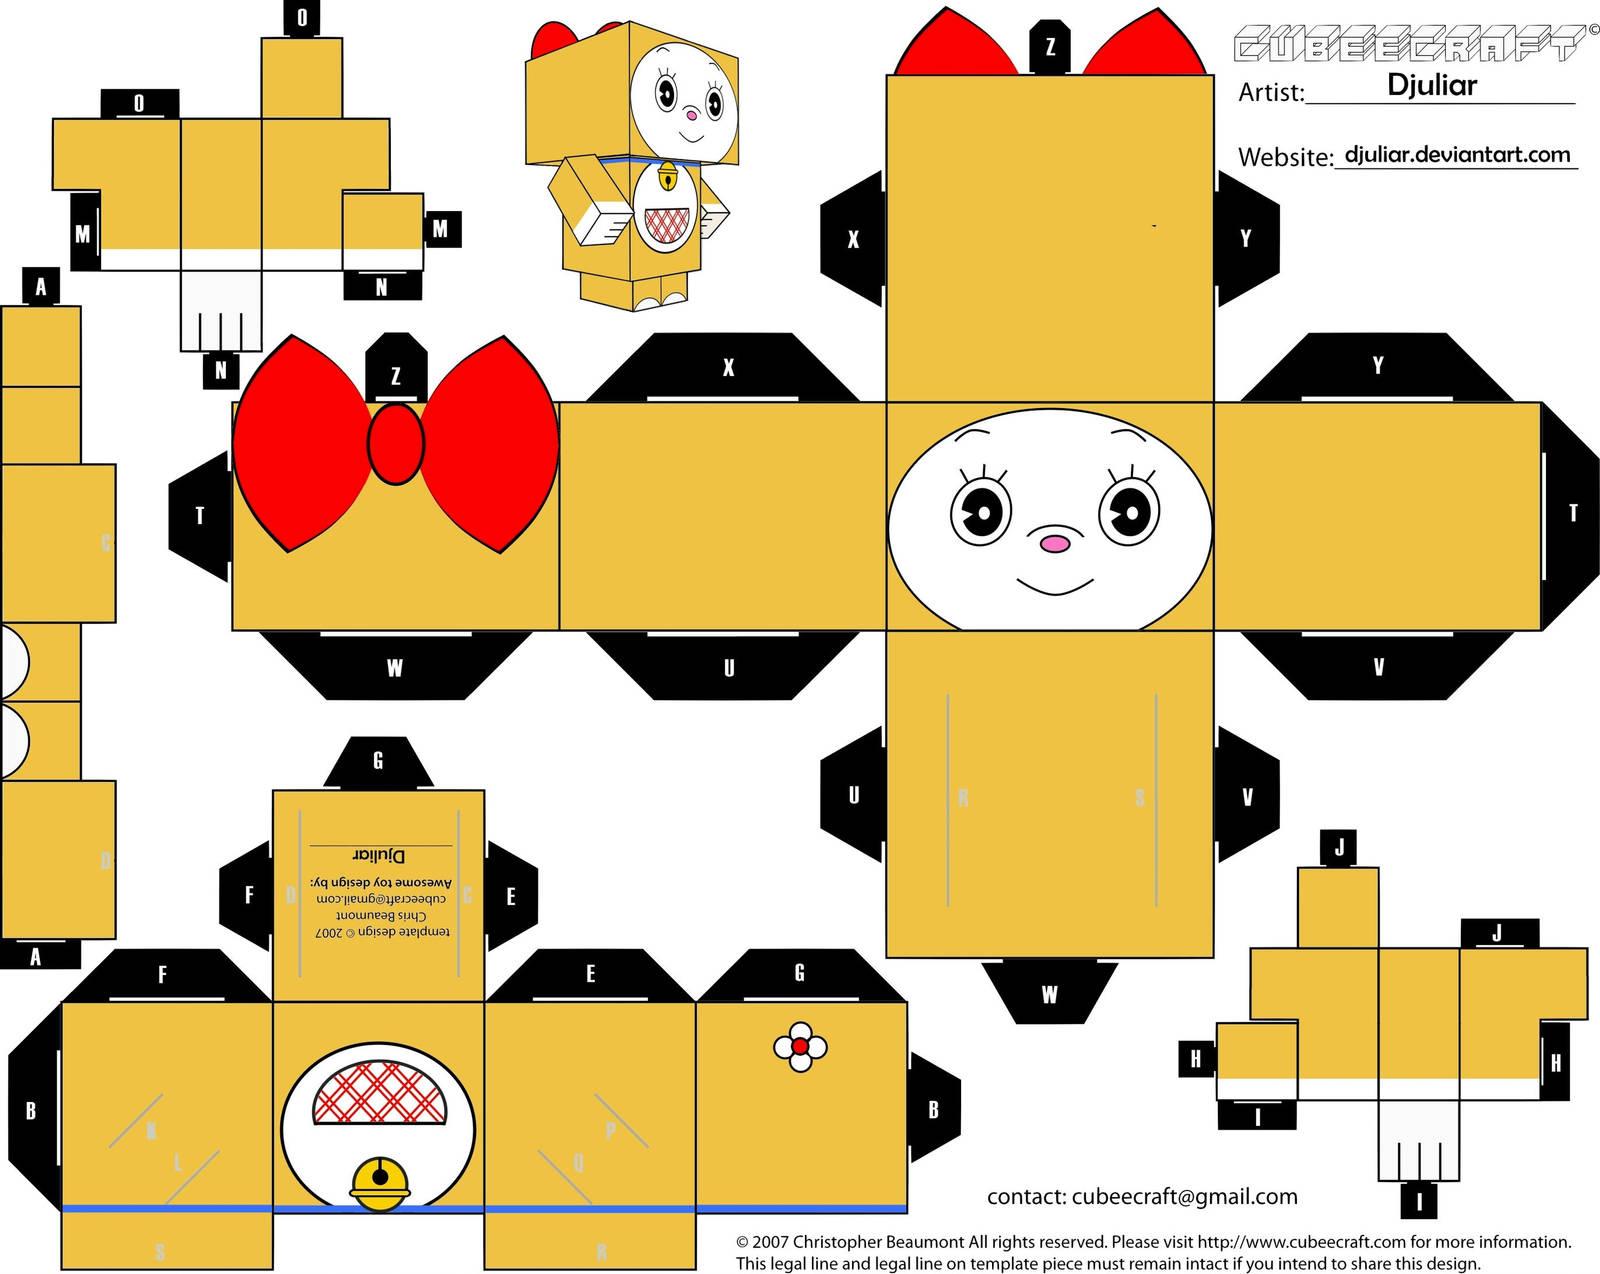 Cubeecraft Dorami By Djuliar by Djuliar